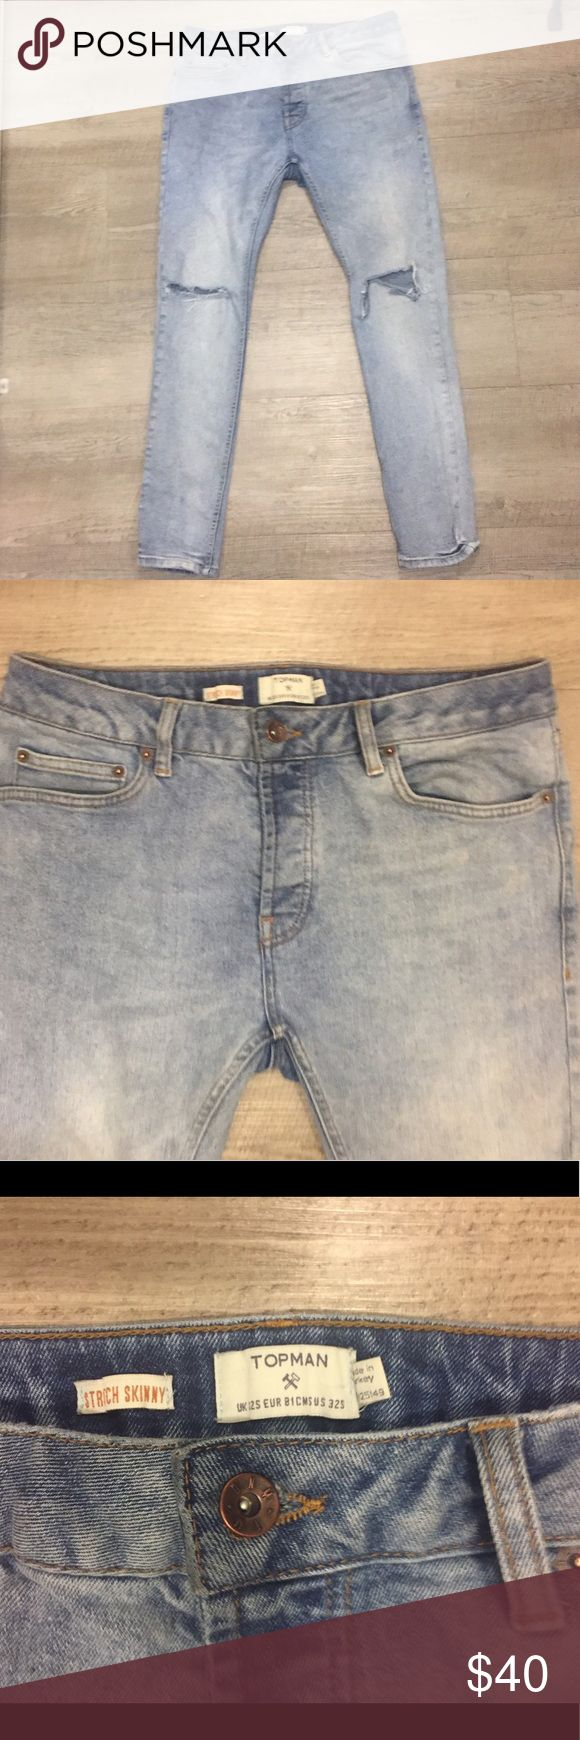 Topman Stretch Skinny Jeans  Open Knee 32s Worn twice Topman Stretch Skinny Light Wash jeans with open knees. Excellent condition. No wear. Topman Jeans Skinny